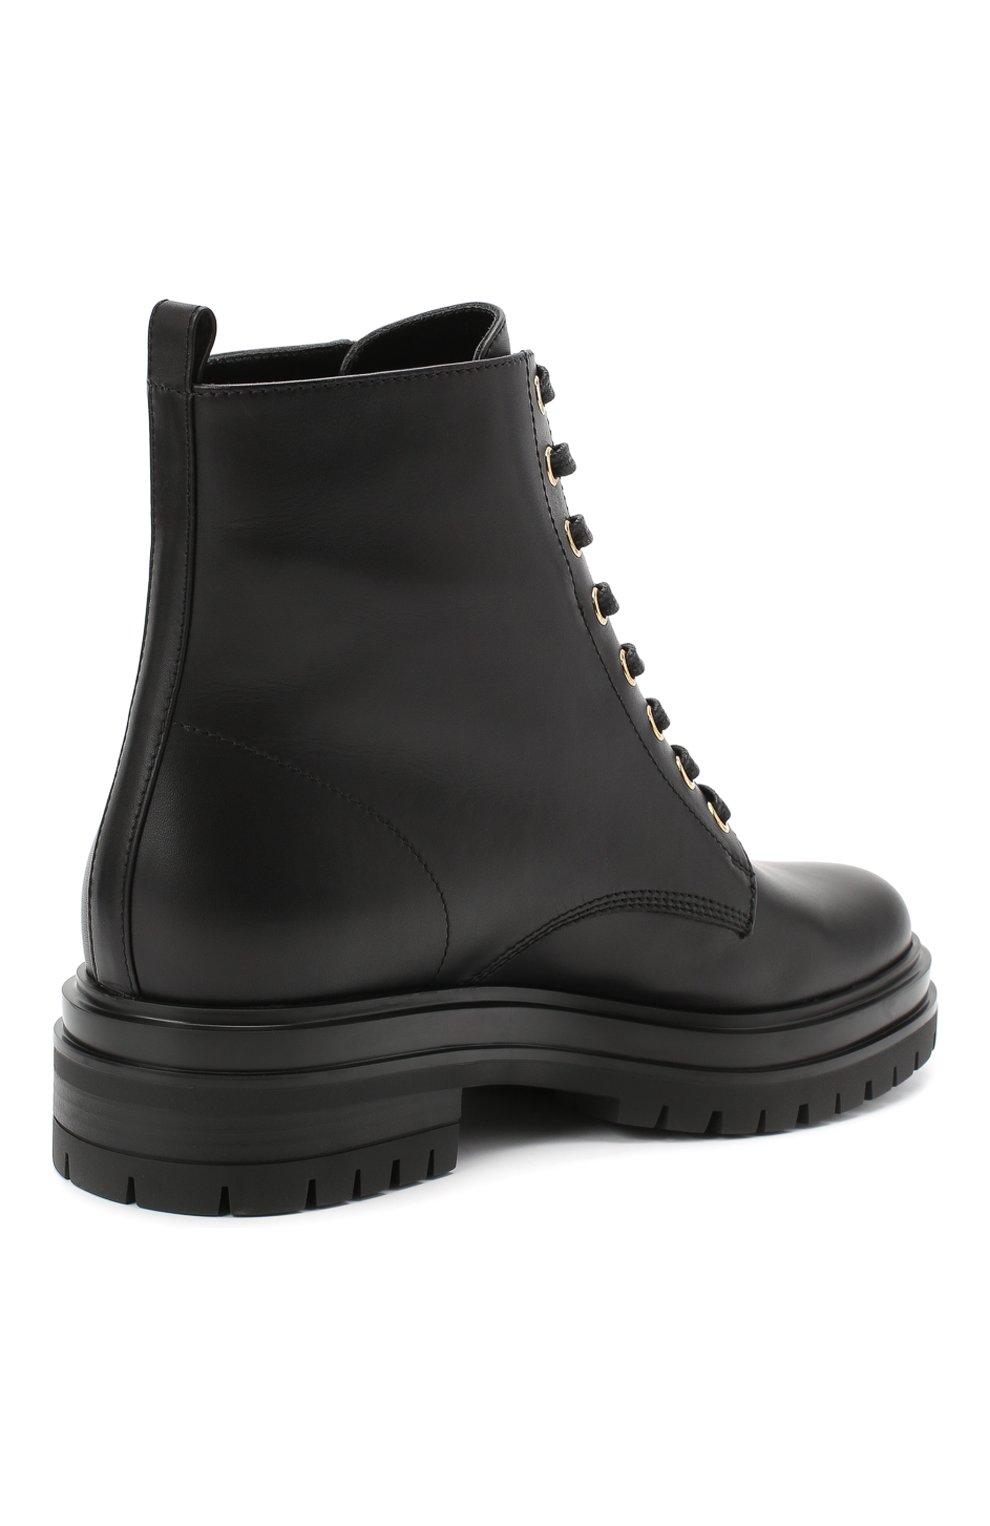 Женские кожаные ботинки turon GIANVITO ROSSI черного цвета, арт. G73432.20G0M.CLNNER0   Фото 4